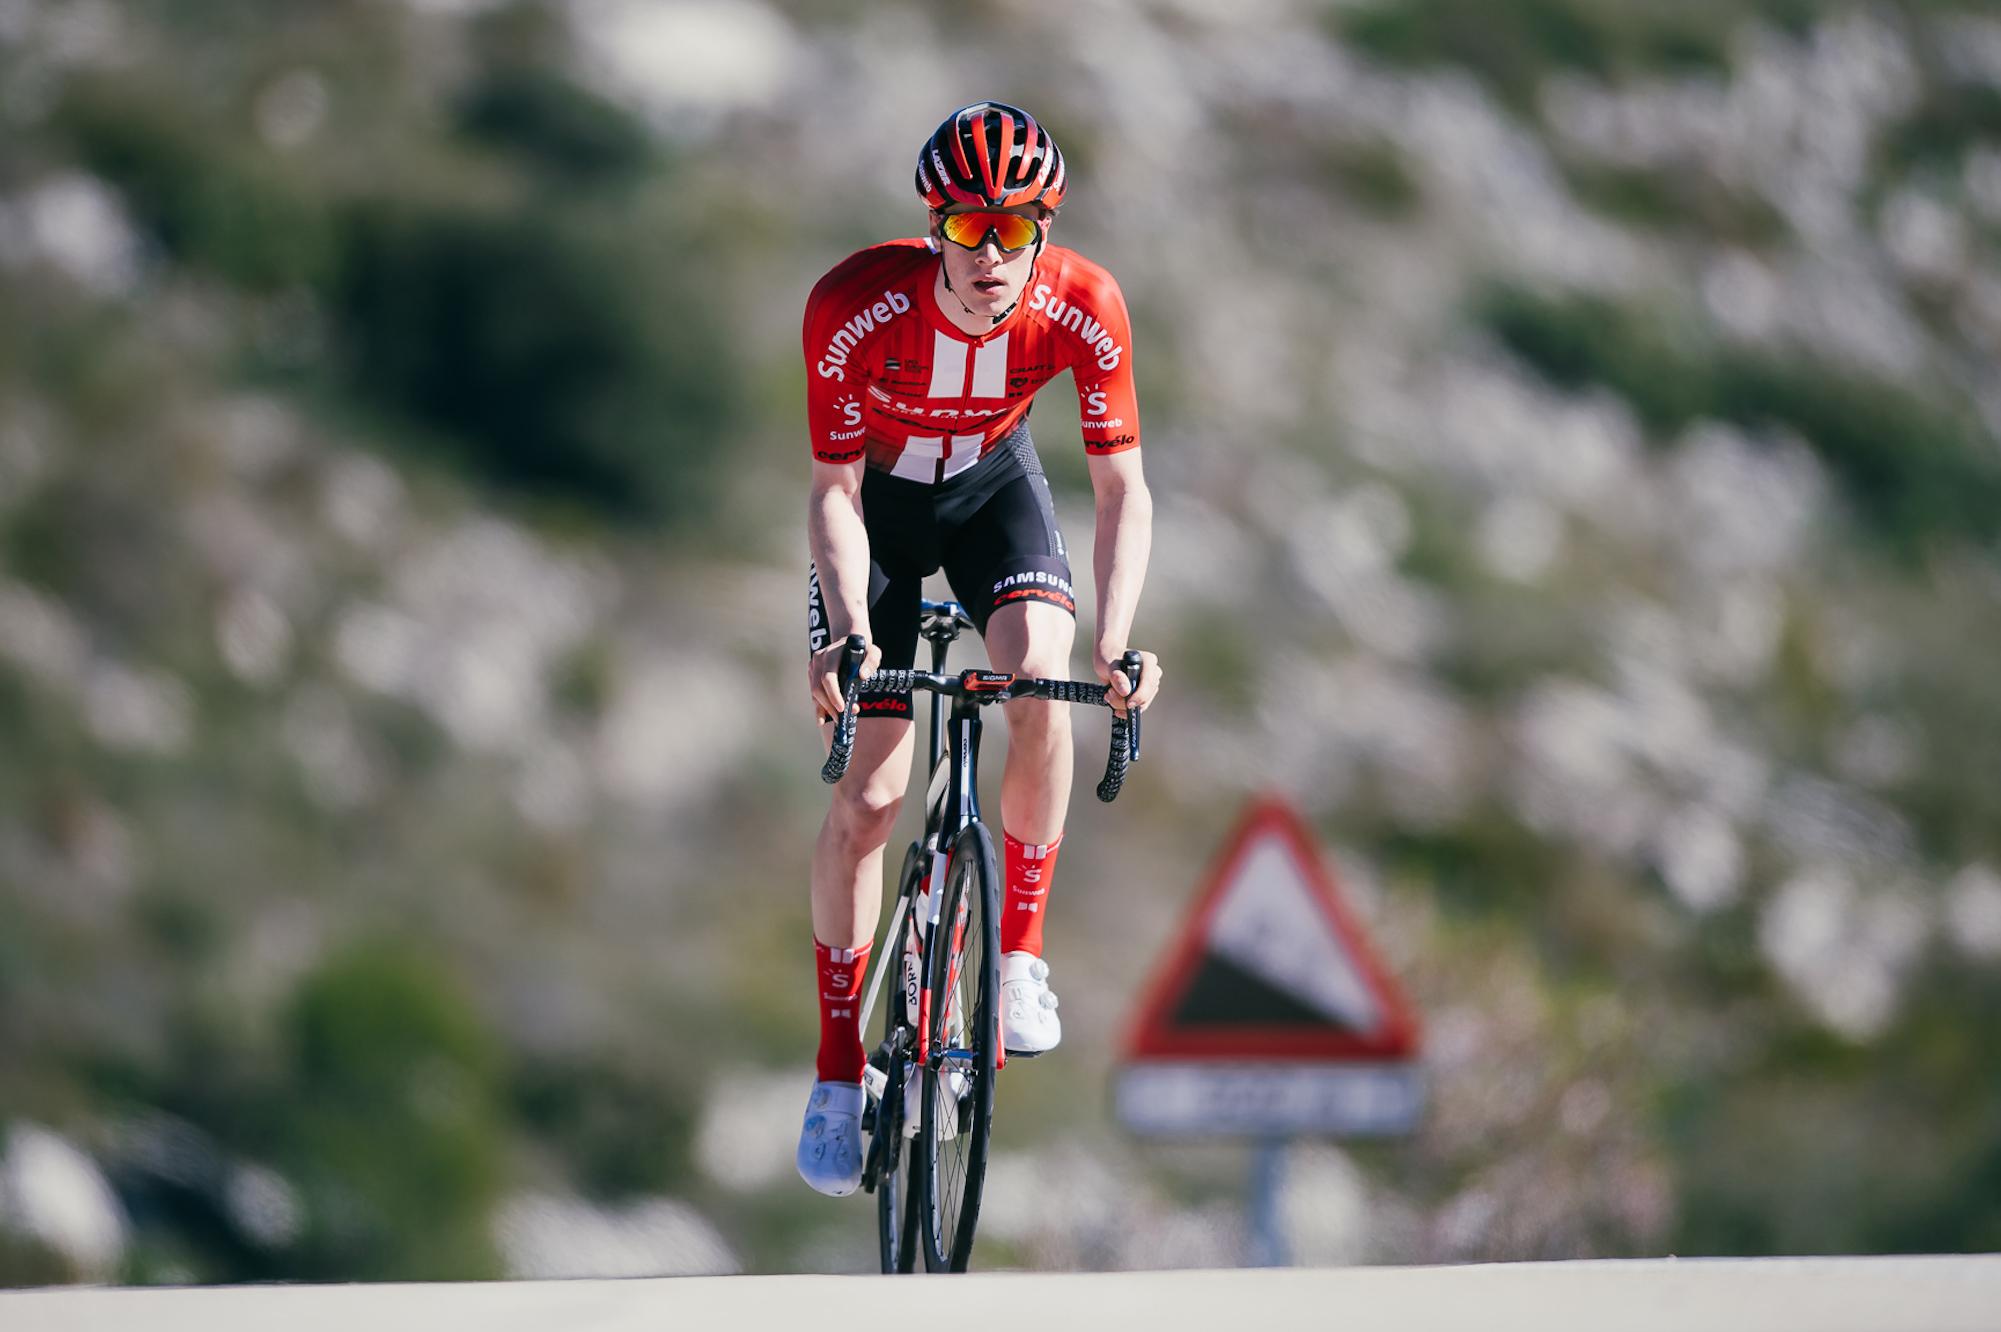 Sunweb rider Edo Maas may never walk again after crash